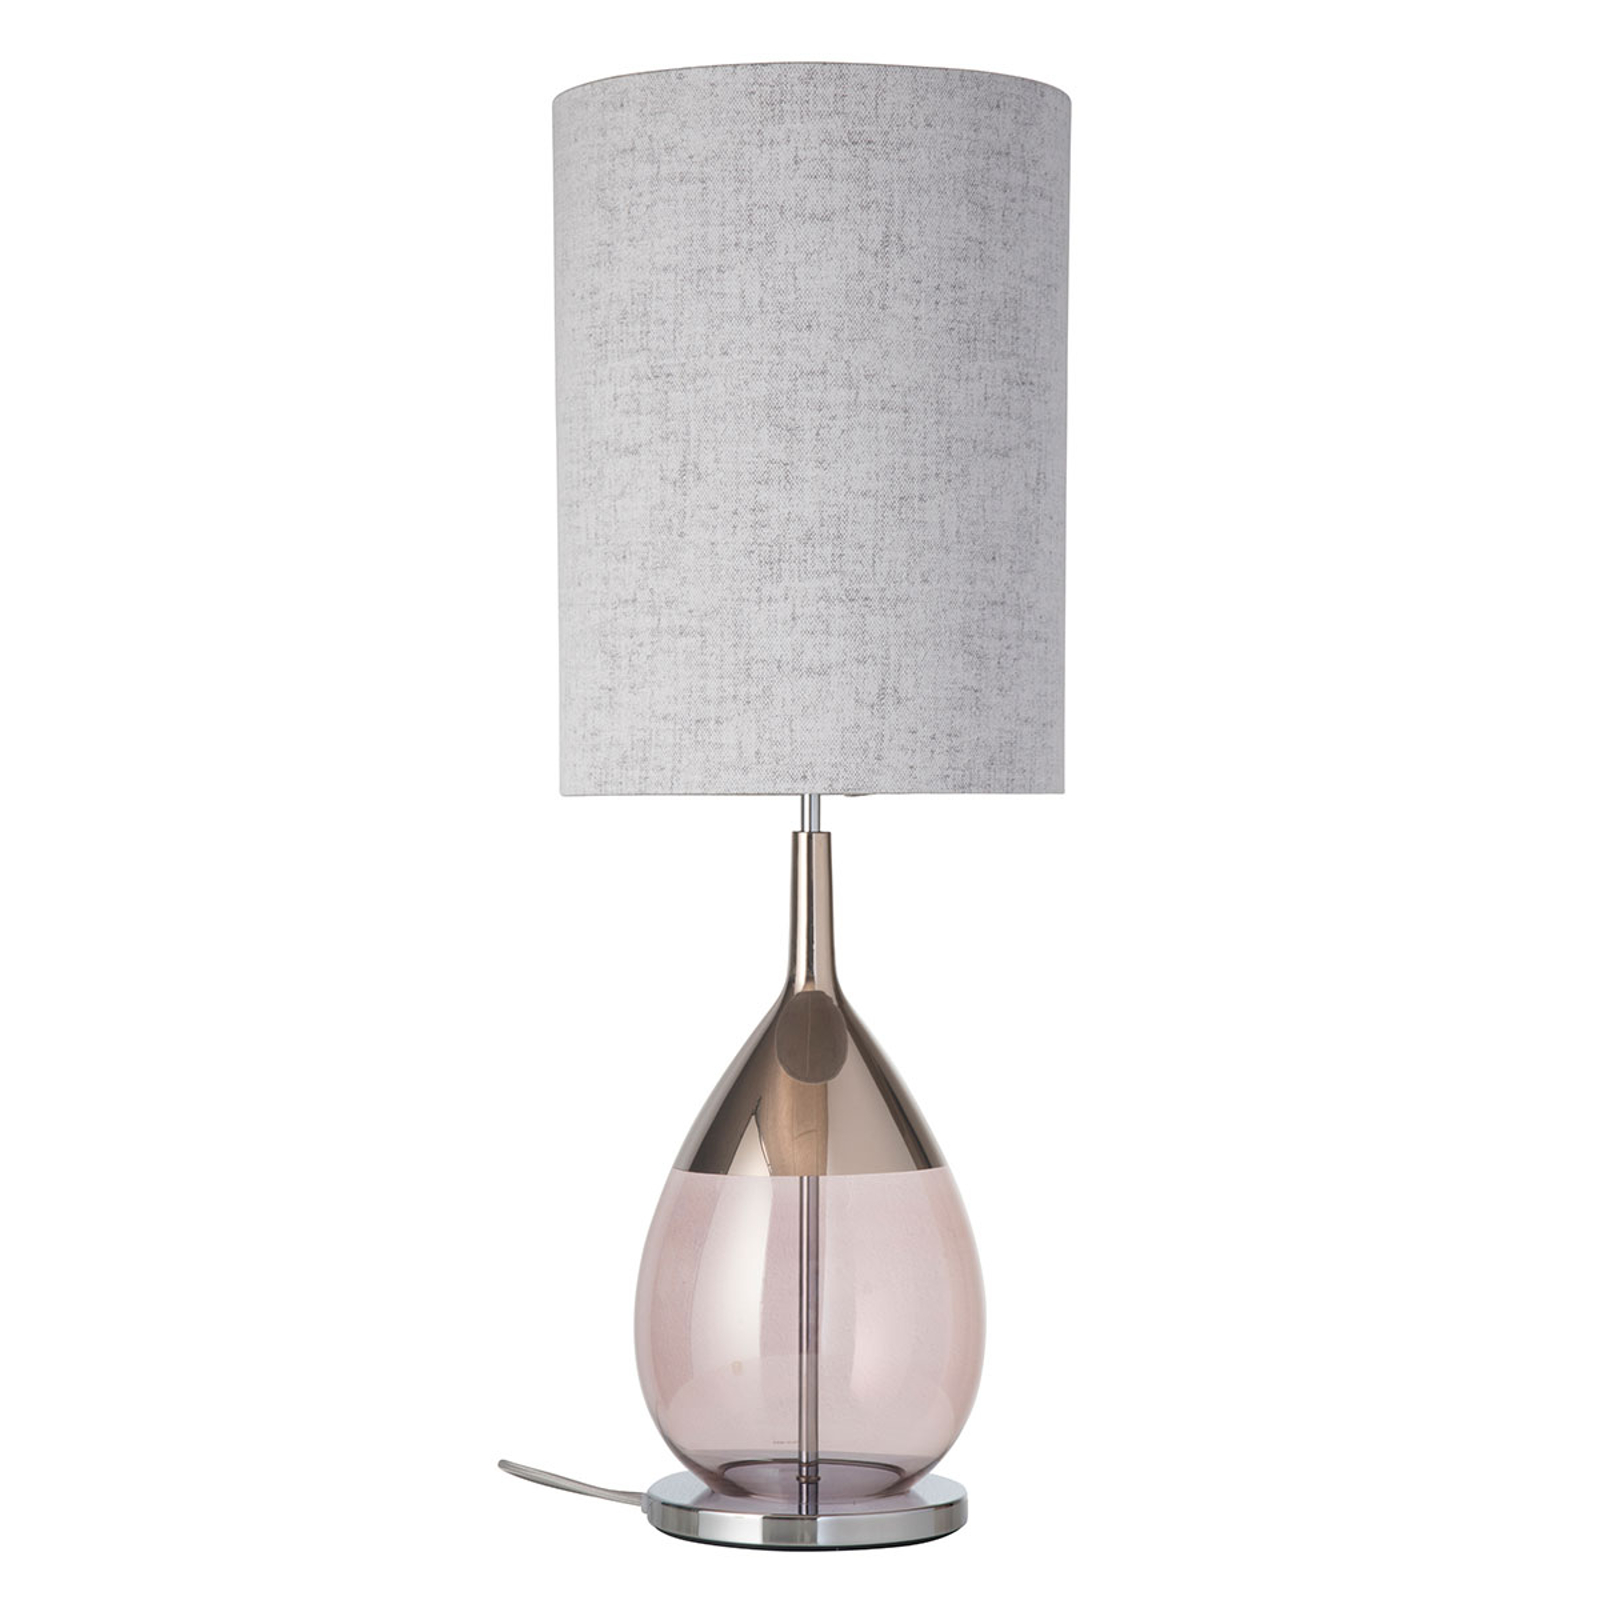 EBB & FLOW Lute tafellamp met kap Marl